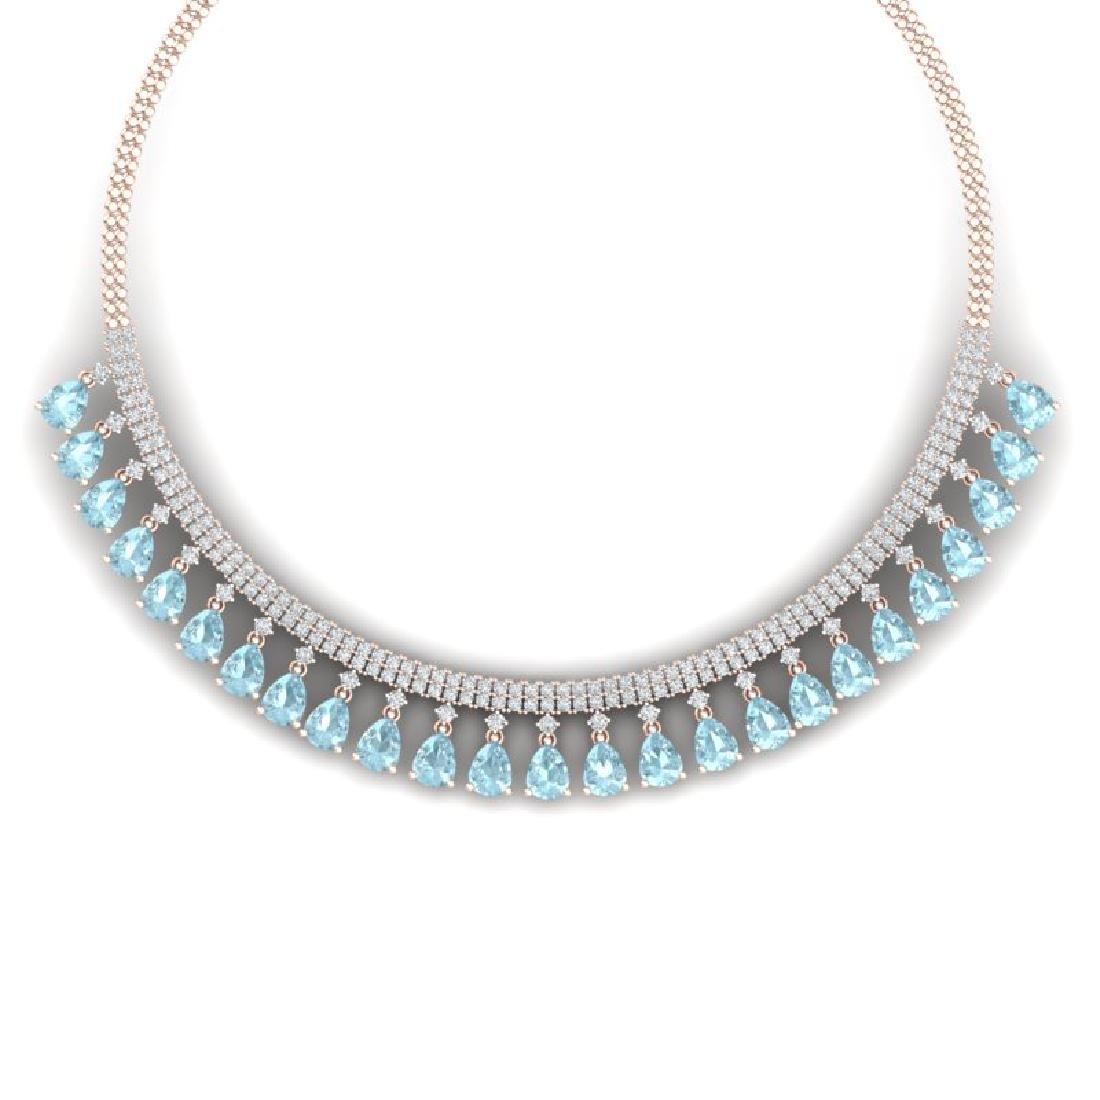 43.05 CTW Royalty Sky Topaz & VS Diamond Necklace 18K